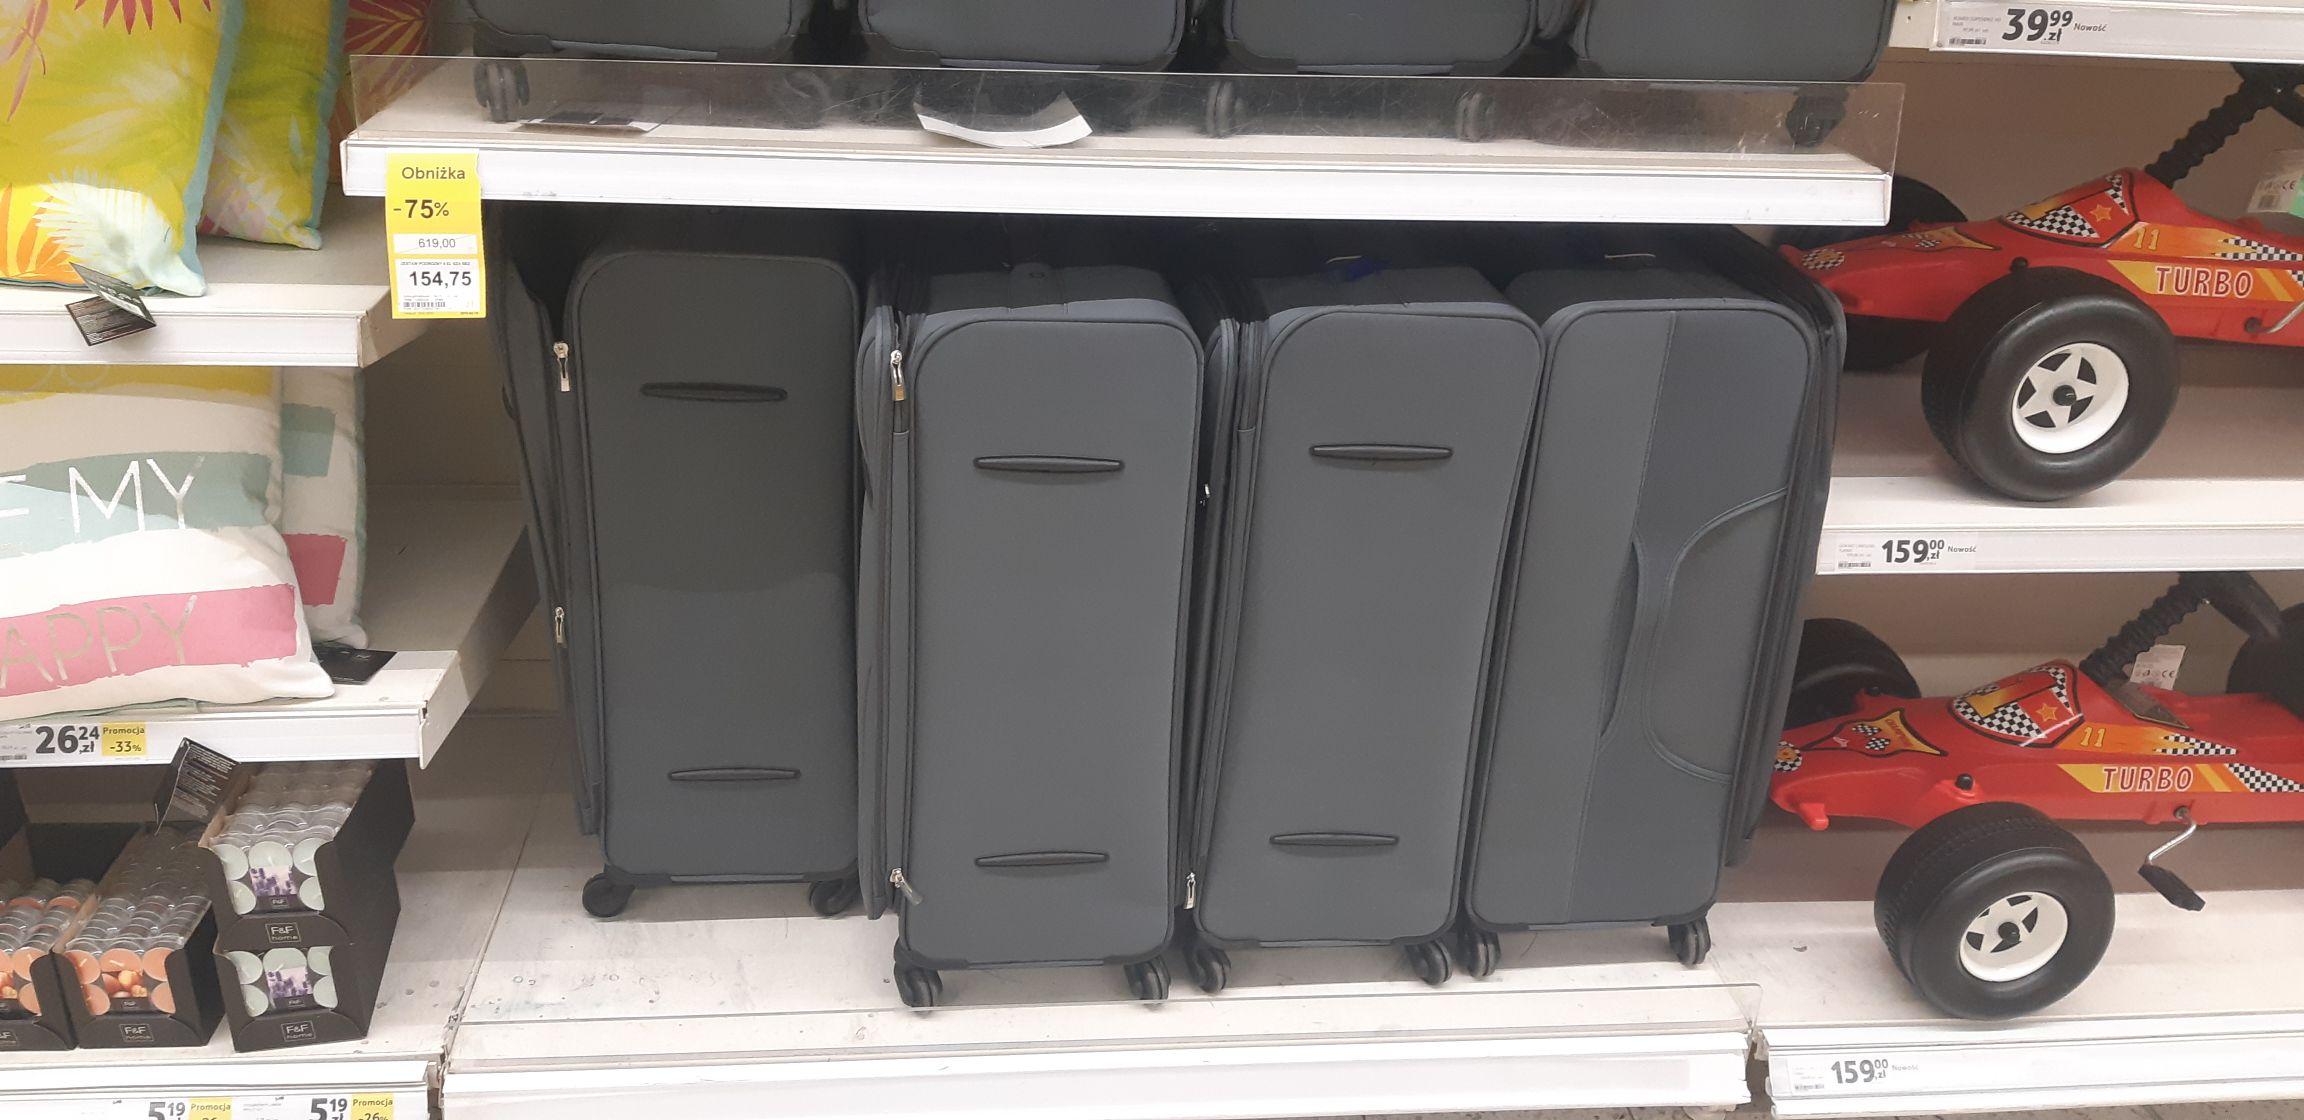 Zestaw walizek 4 w 1 - Tesco